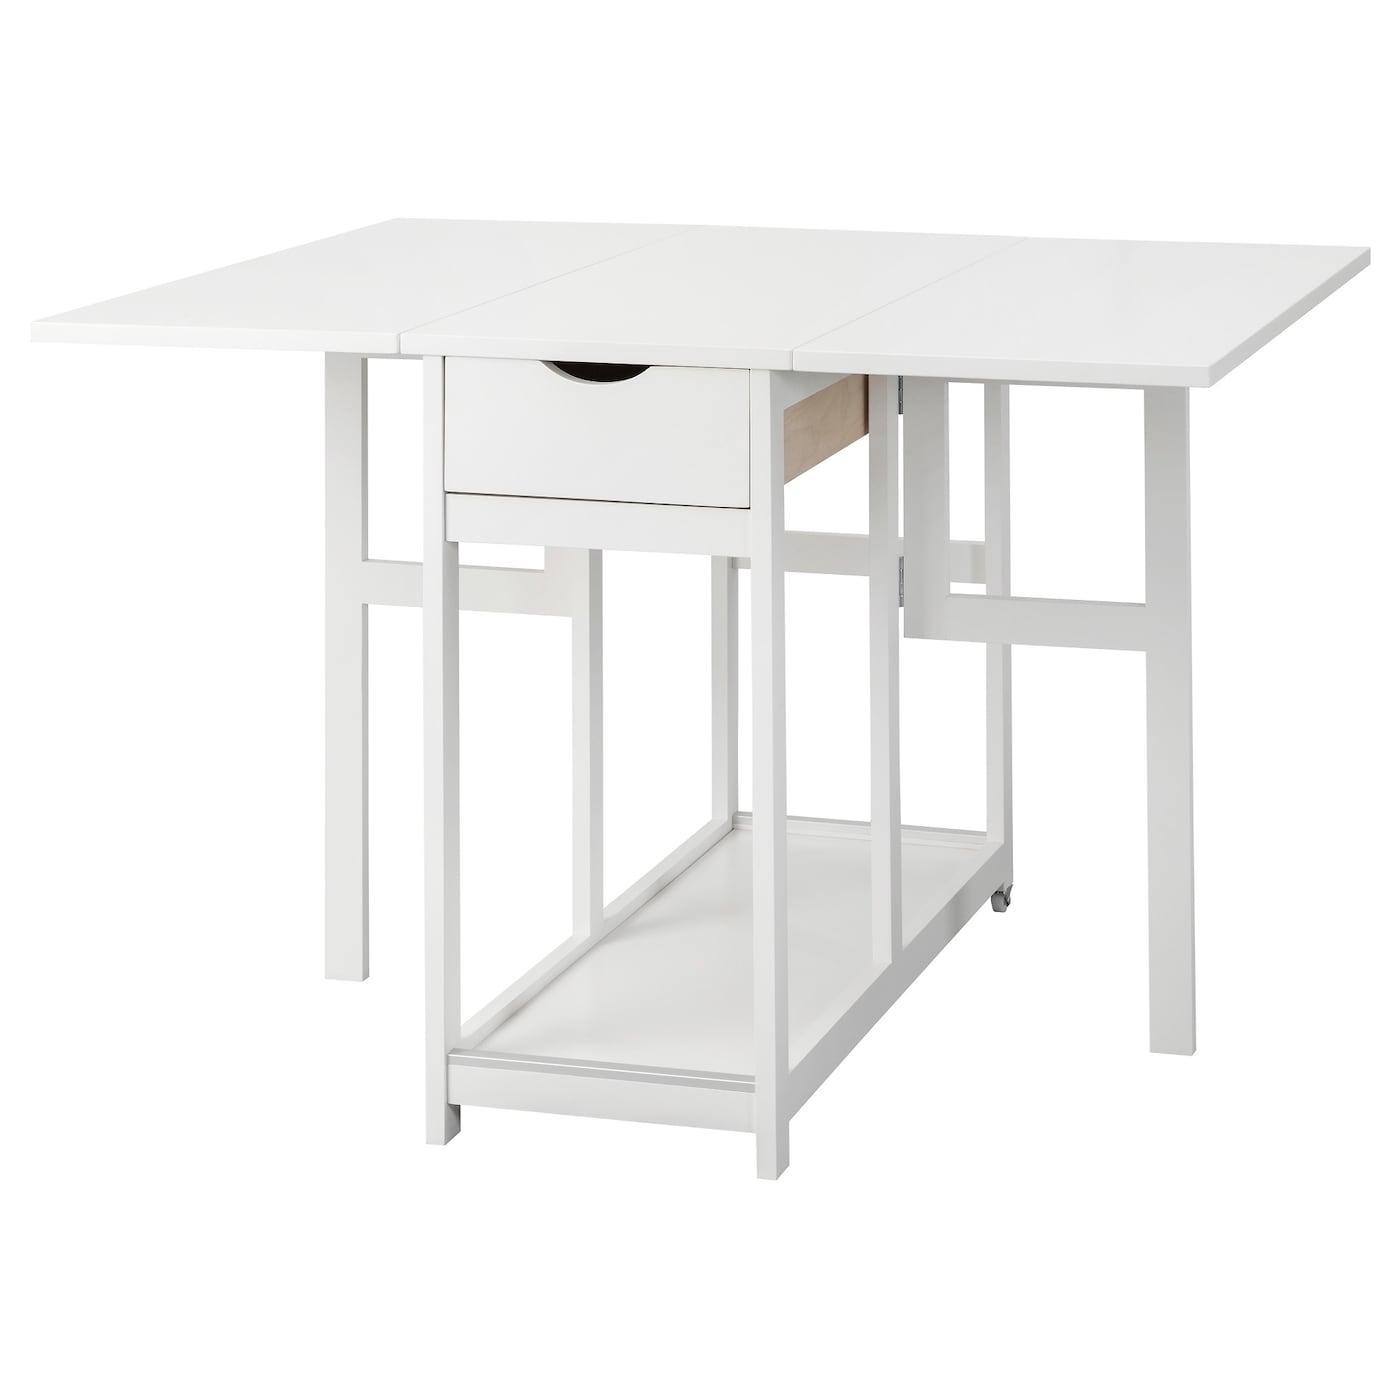 Gisslaboda mesa de hojas abatibles blanco 38 77 116 x 95 - Ikea mesa blanca ...